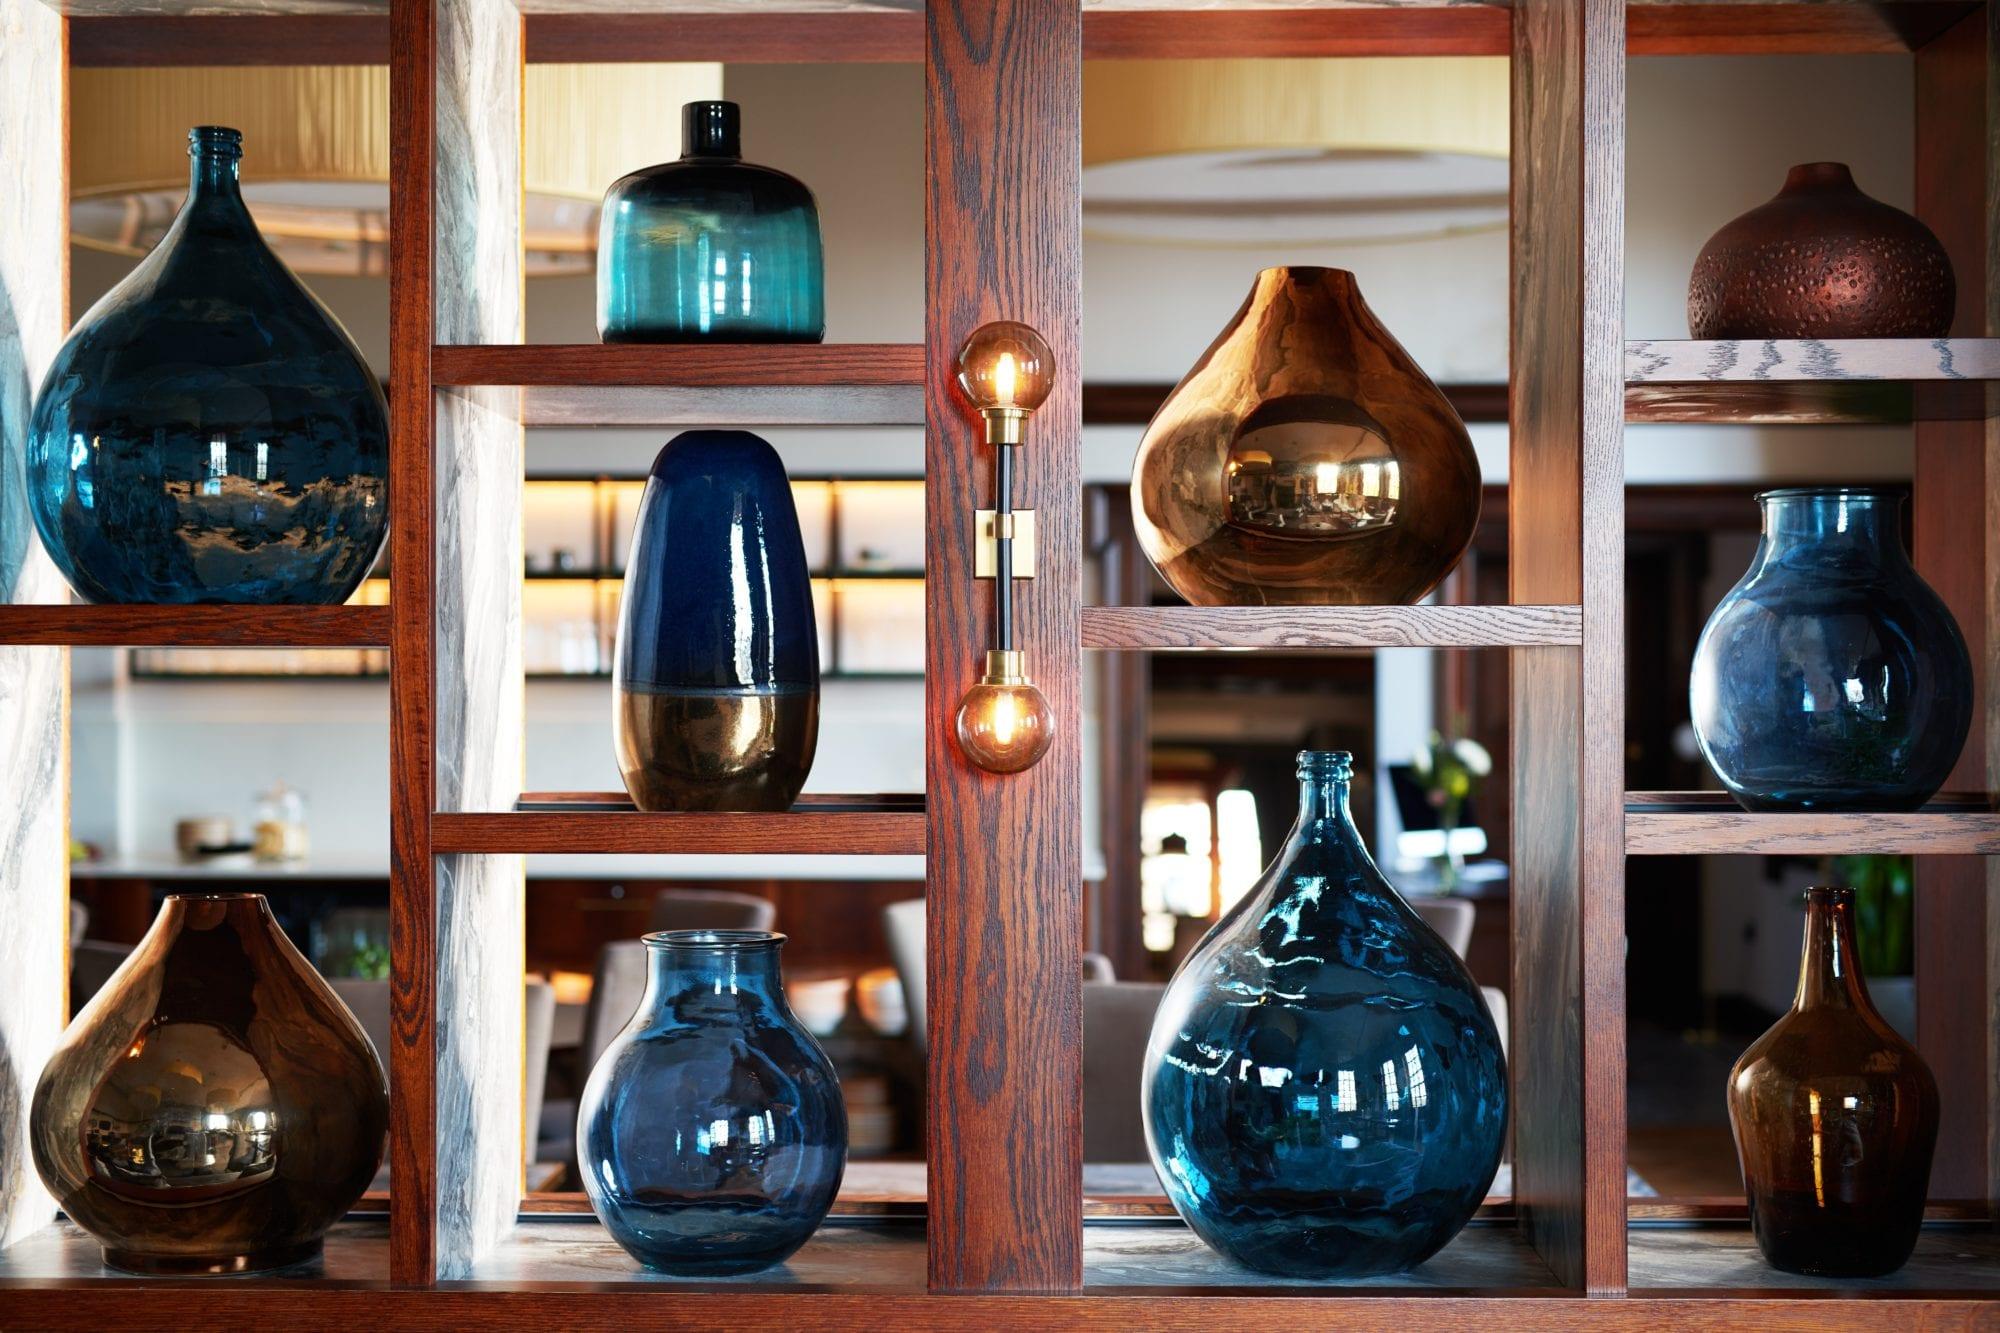 The Grand Vases